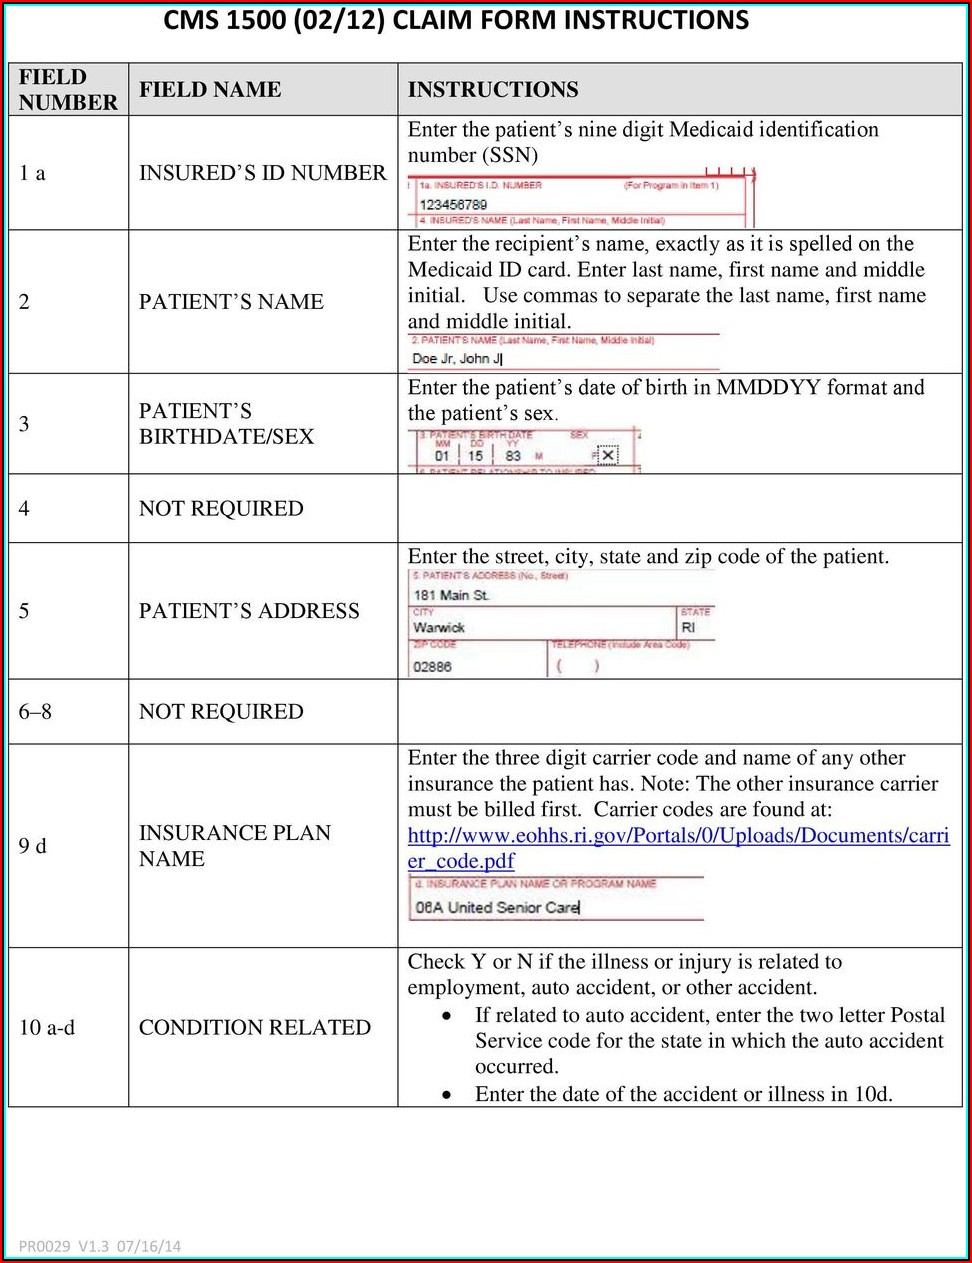 Cms Form 1500 Instructions